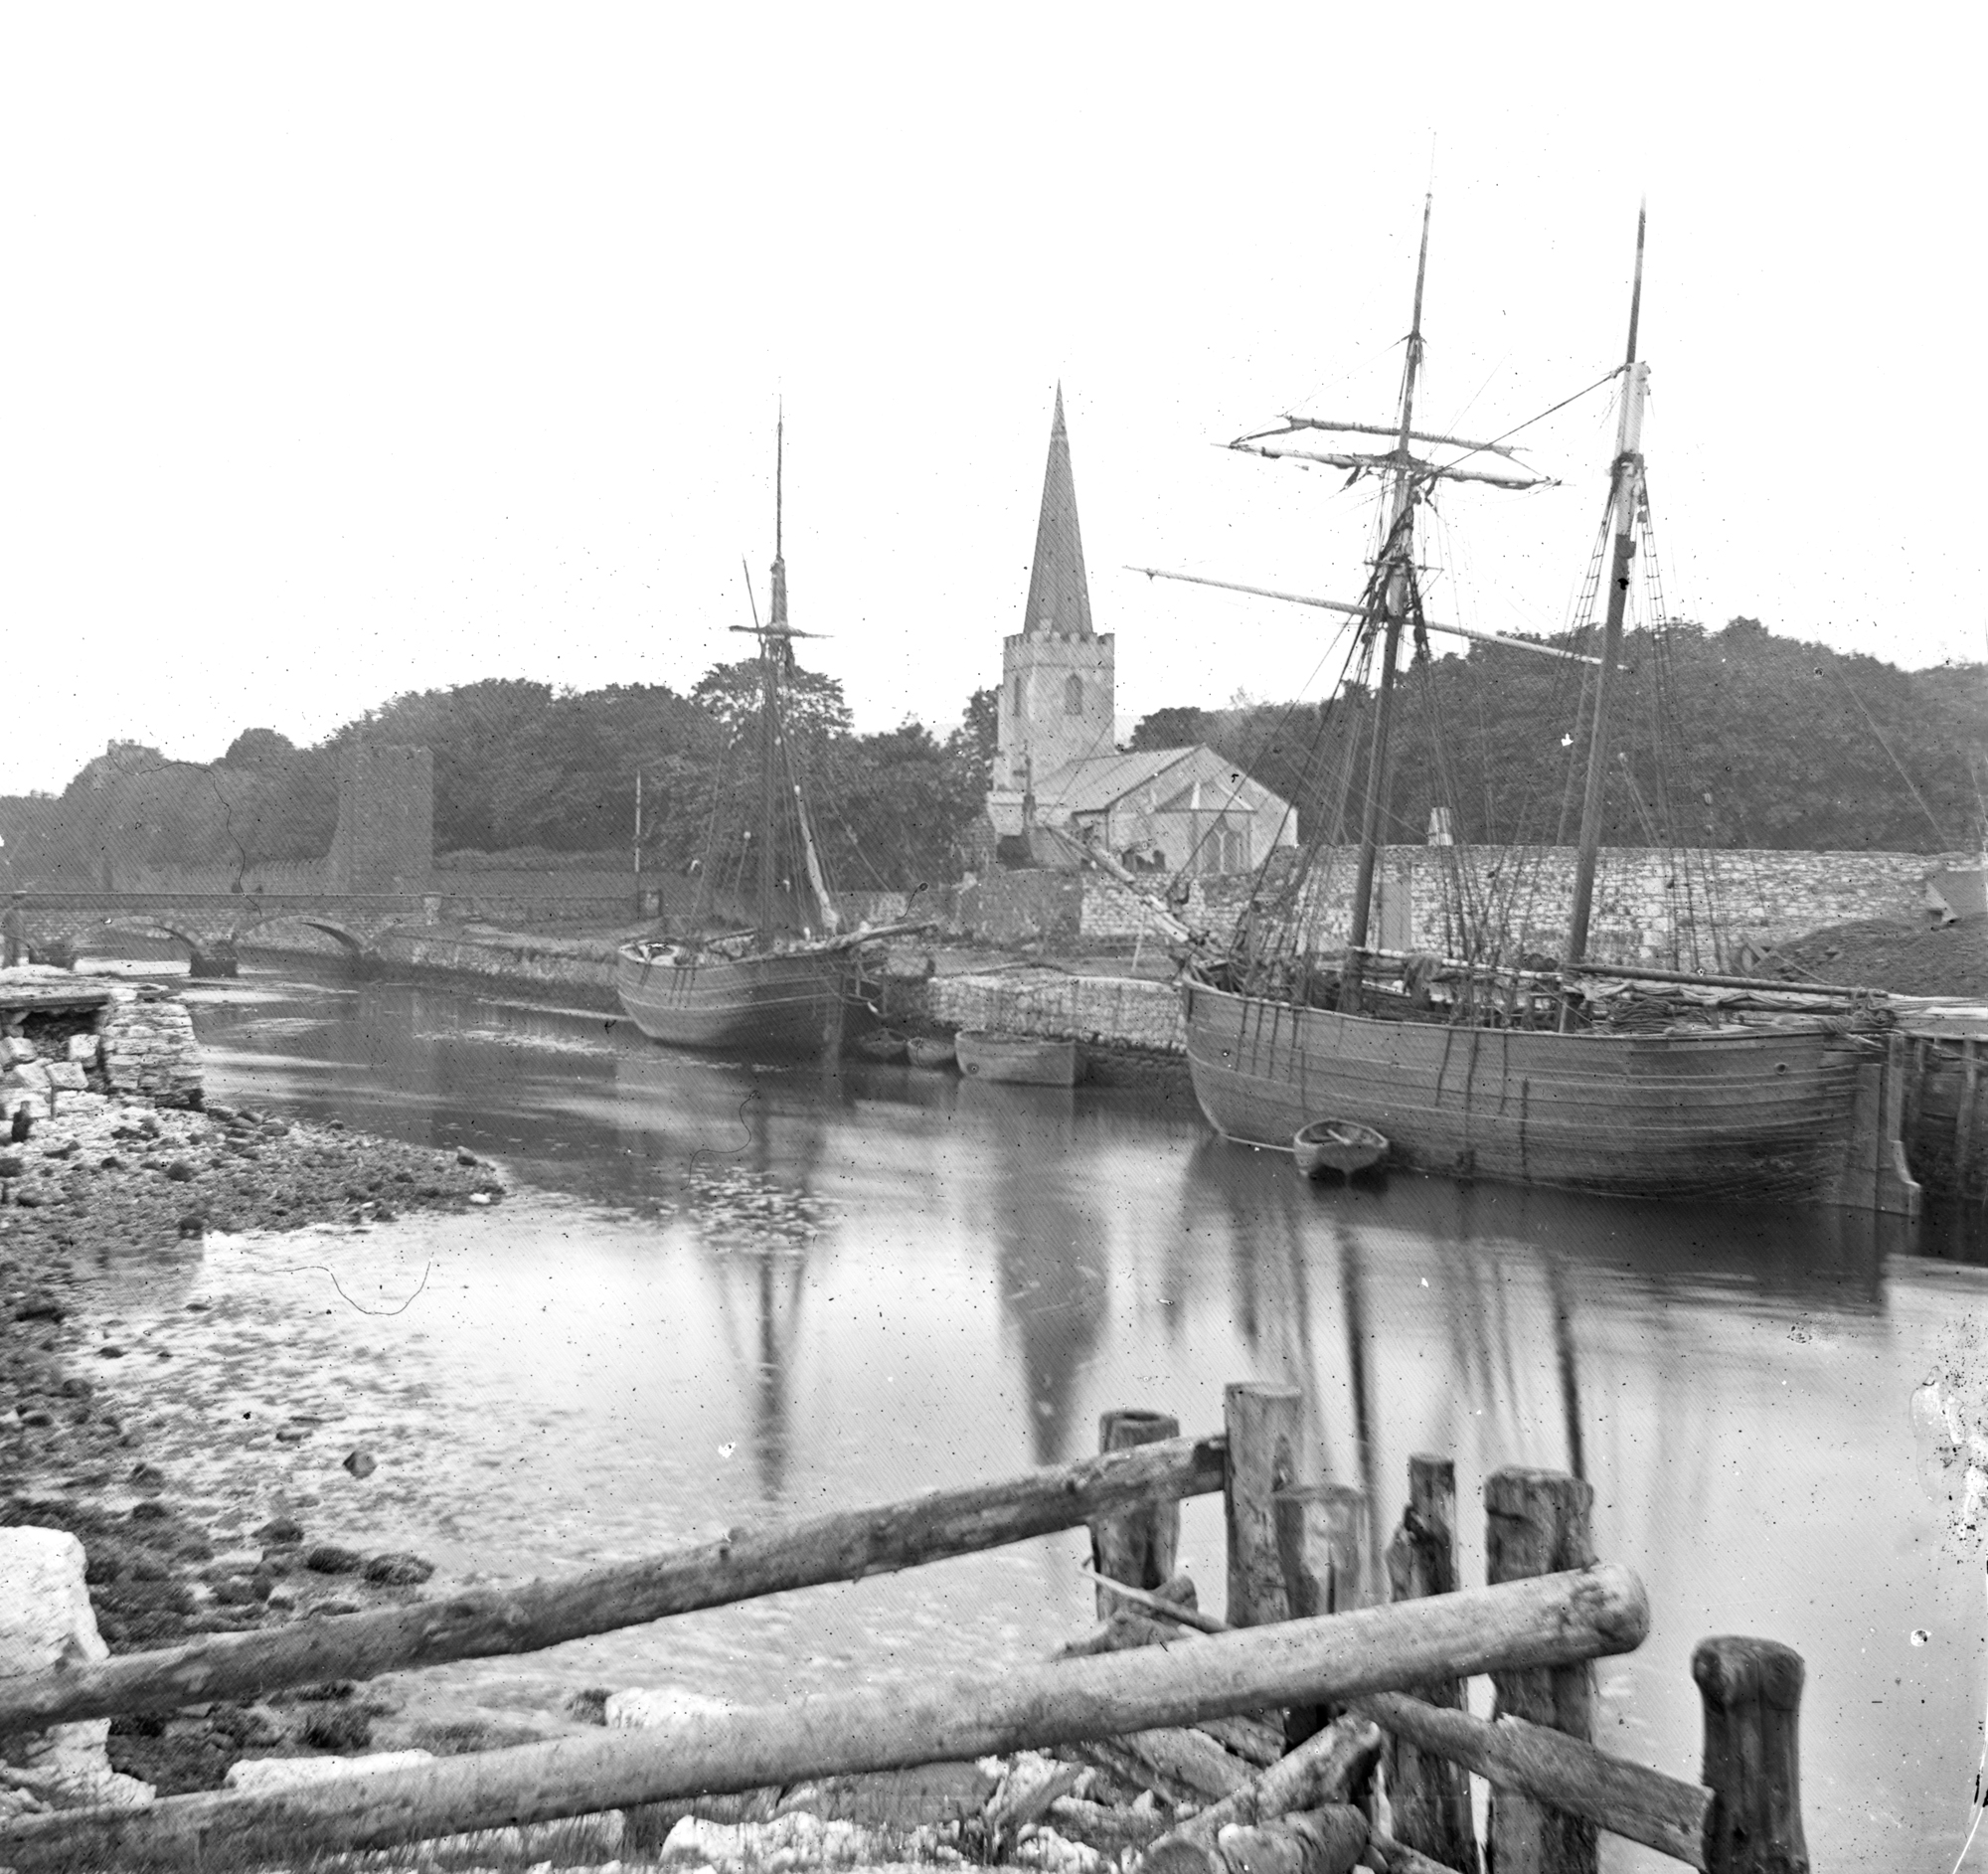 Glenarm, Co. Antrim.